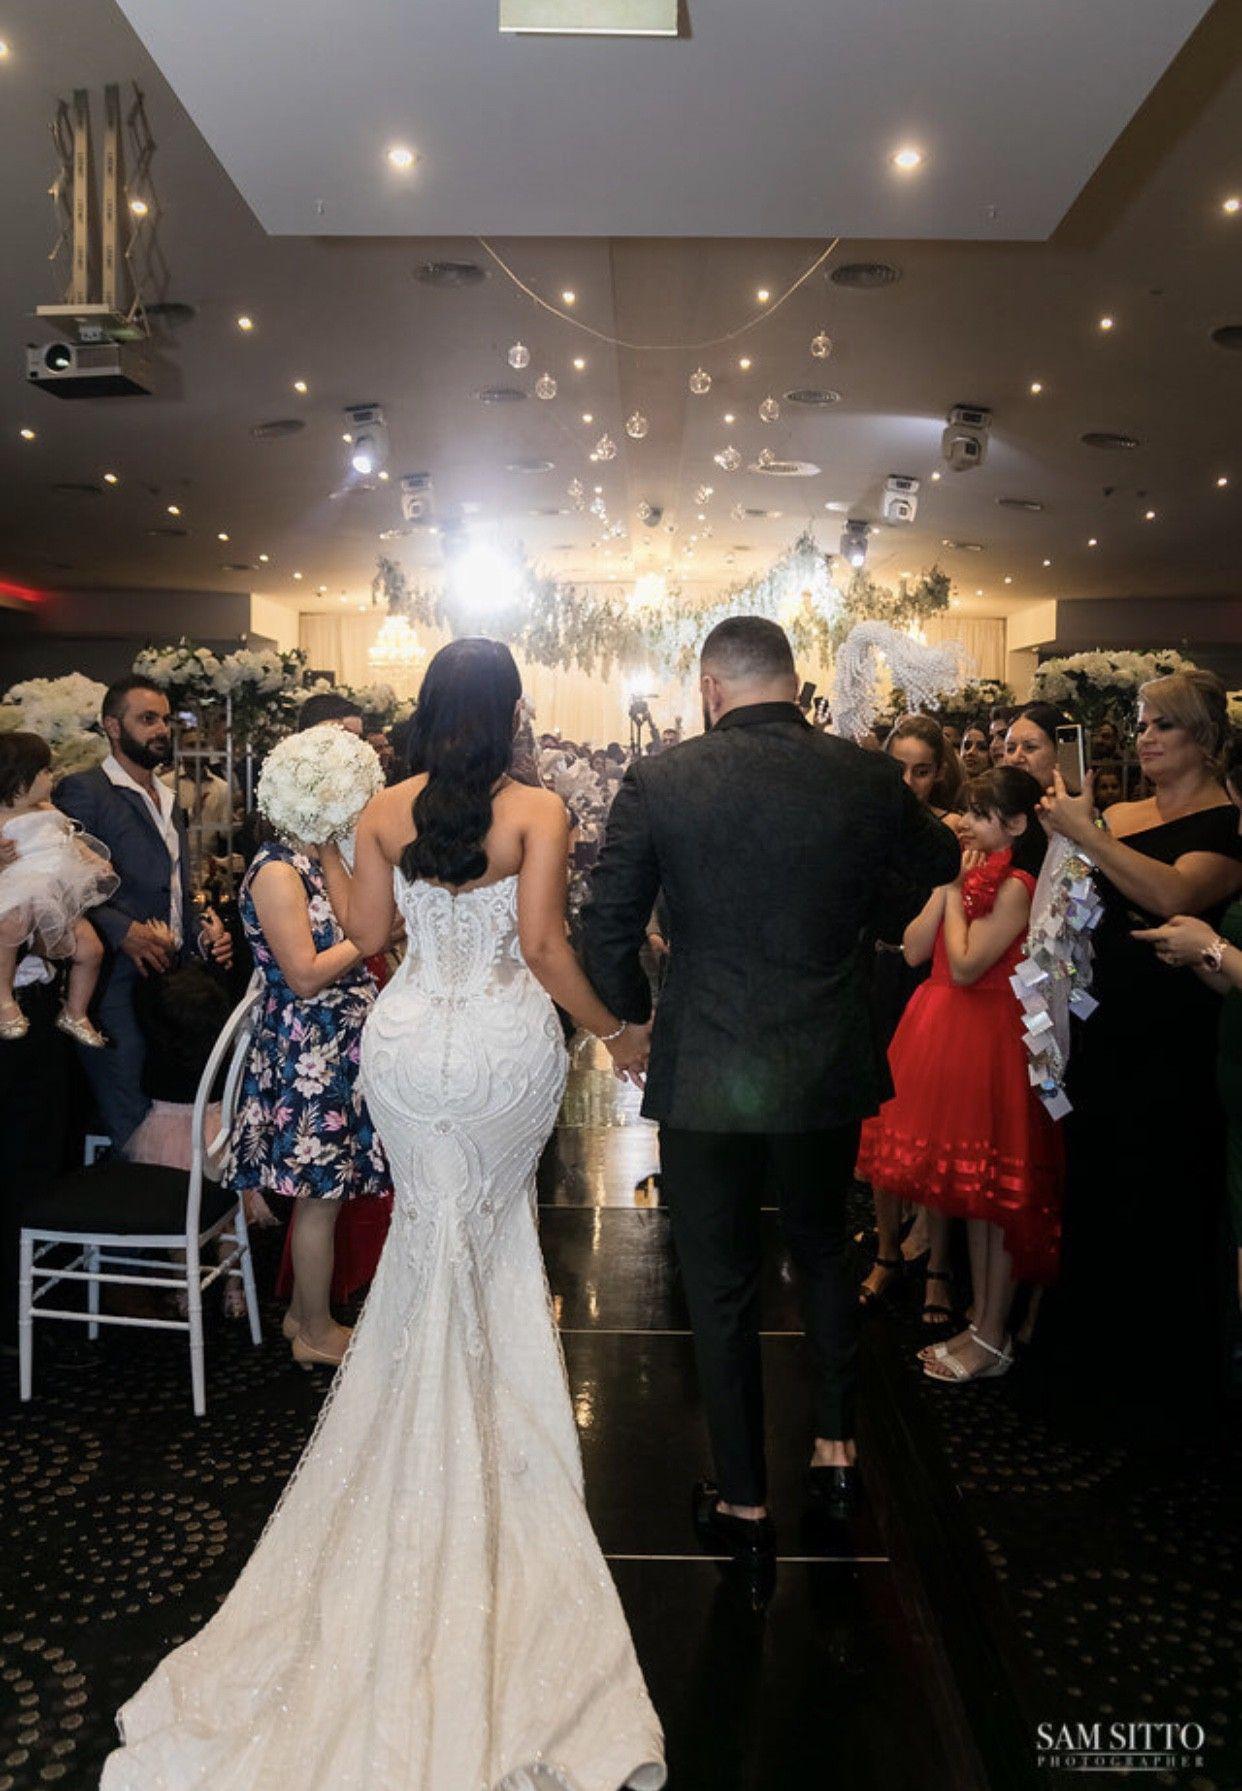 Hayley Paige Comet Preloved Wedding Dress Save 53 Preloved Wedding Dresses Tea Length Bridesmaid Dresses Plus Size Wedding Gowns [ 1331 x 874 Pixel ]